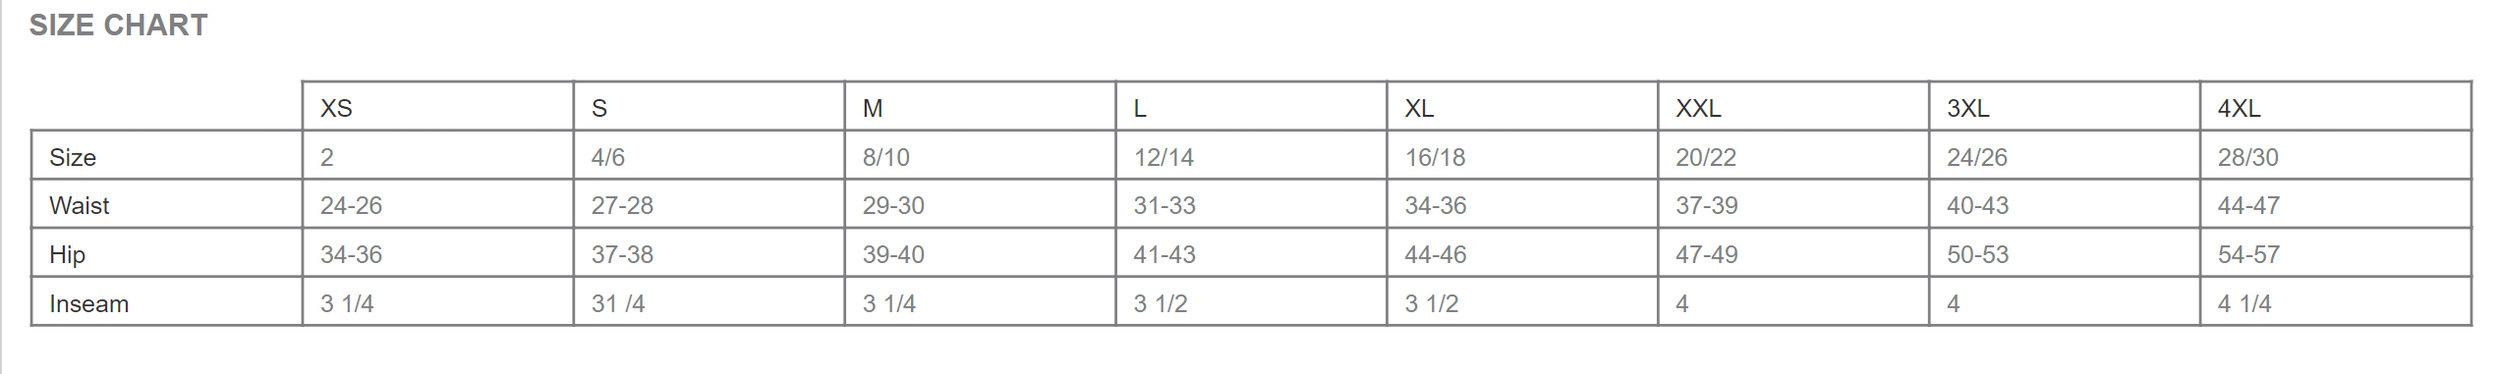 Sport Tek Ladies Cadence Running Shorts Atlantic Embroidery Works In i̇stanbul, infobel has listed 7 registered companies. sport tek ladies cadence running shorts atlantic embroidery works